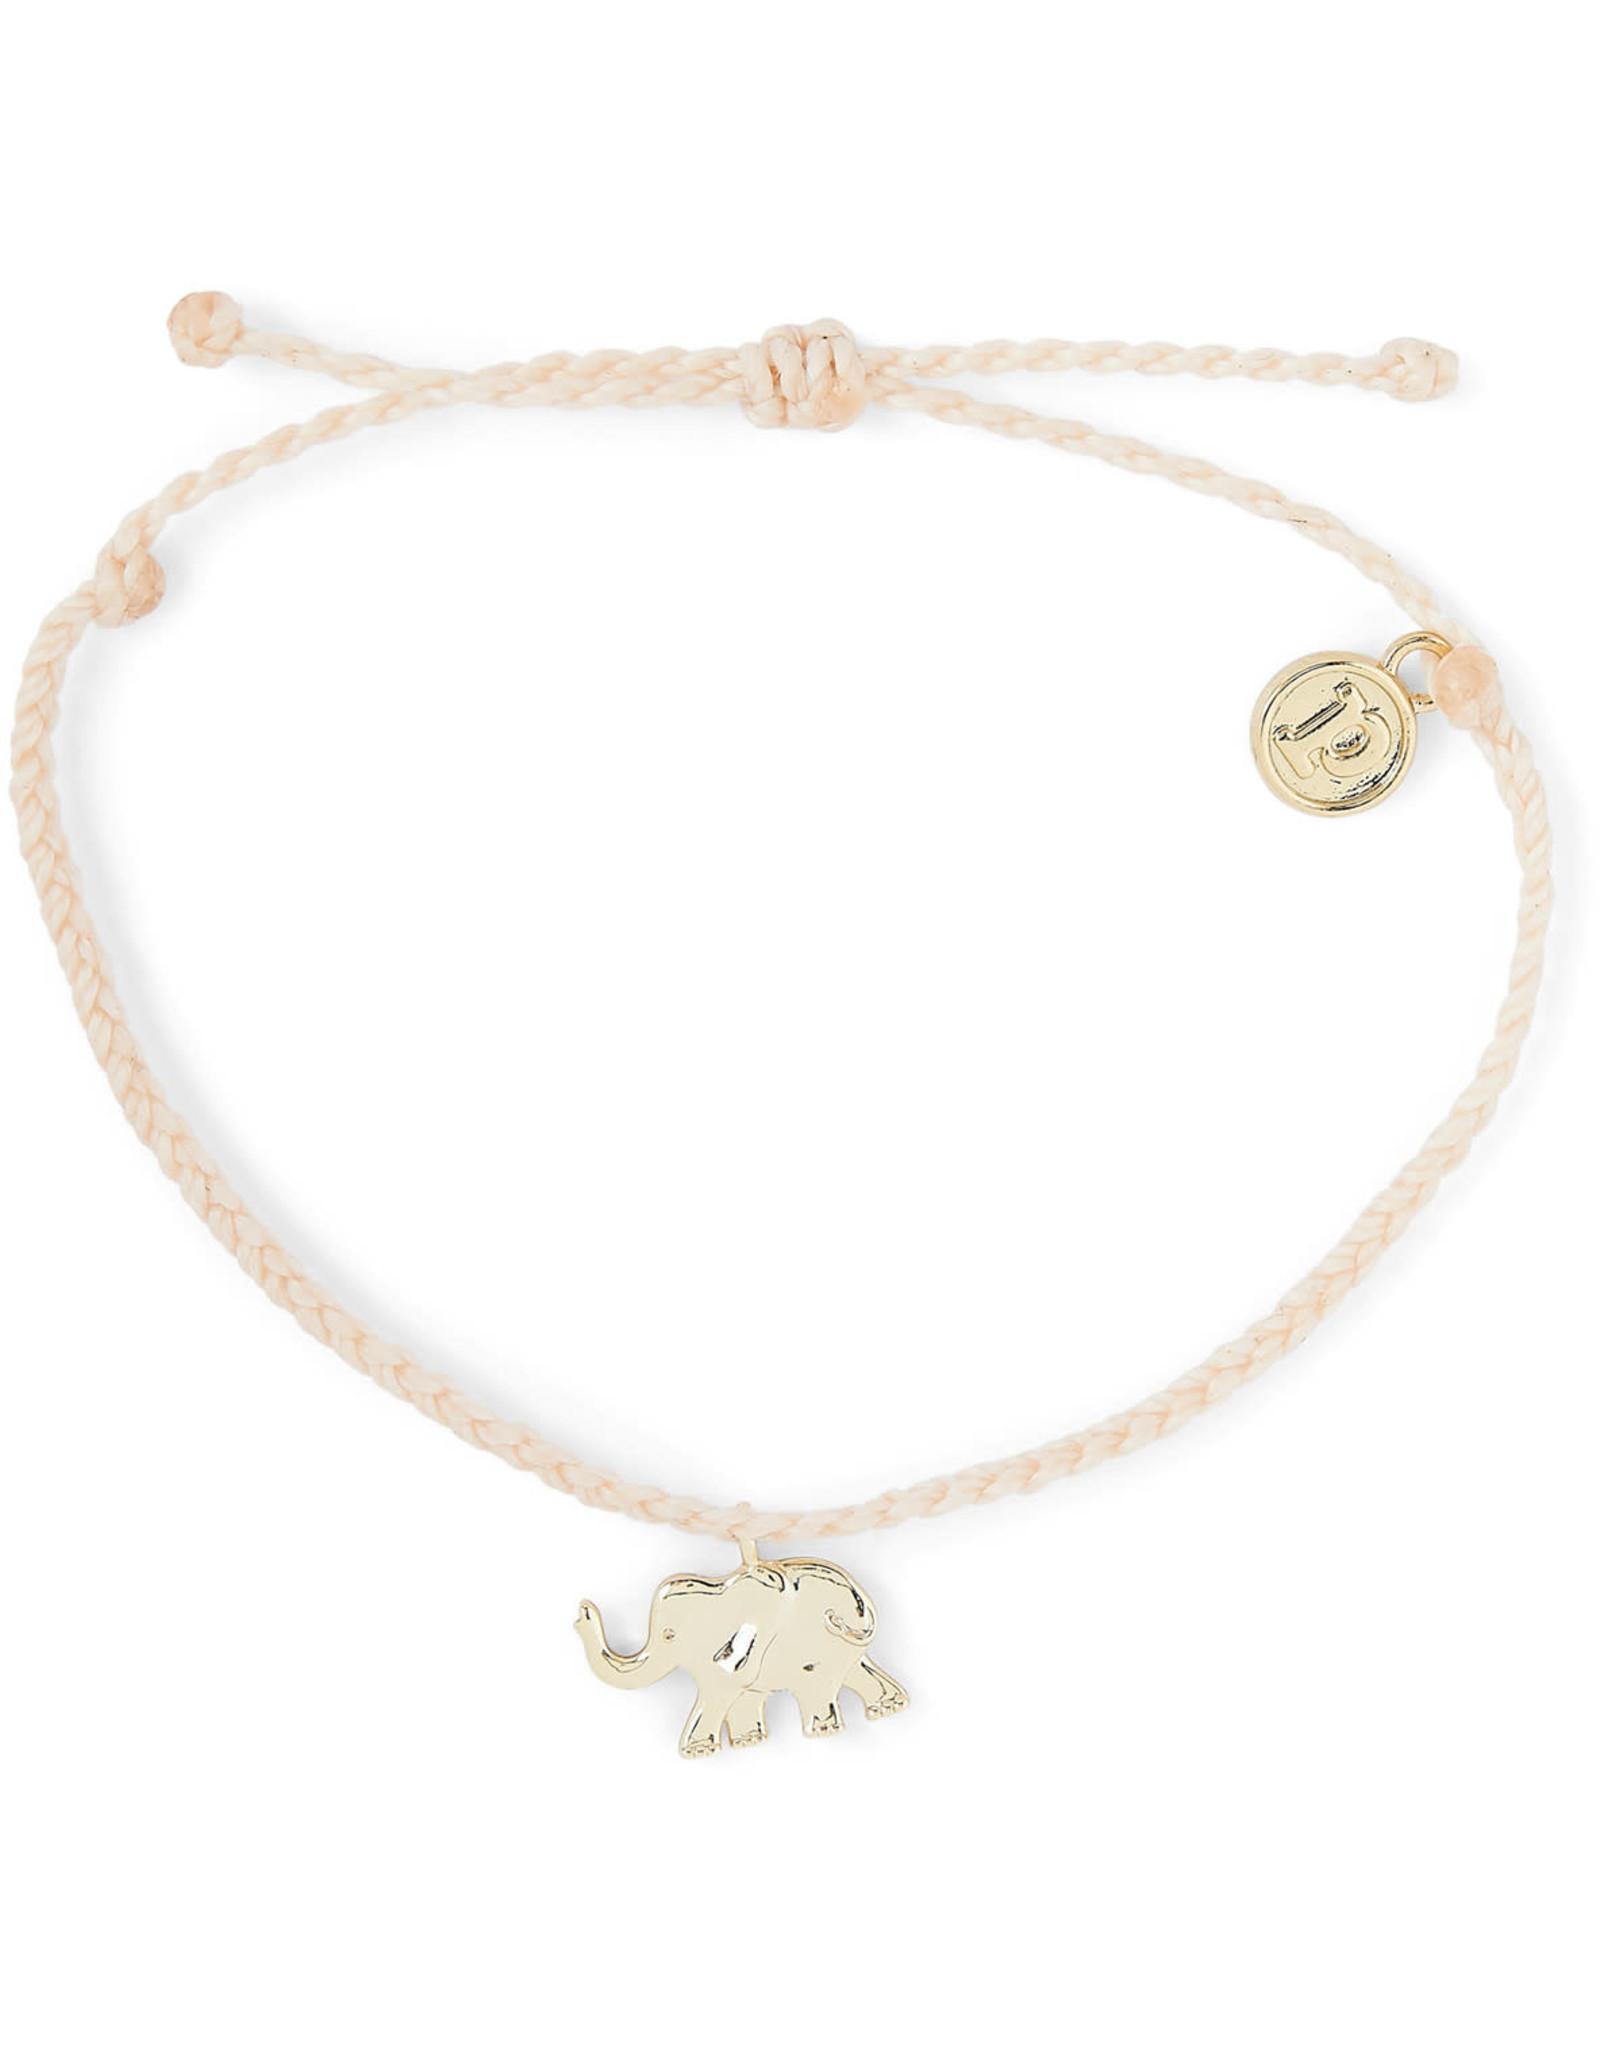 PURA VIDA BRACELET GOLD ELEPHANT VANILLA